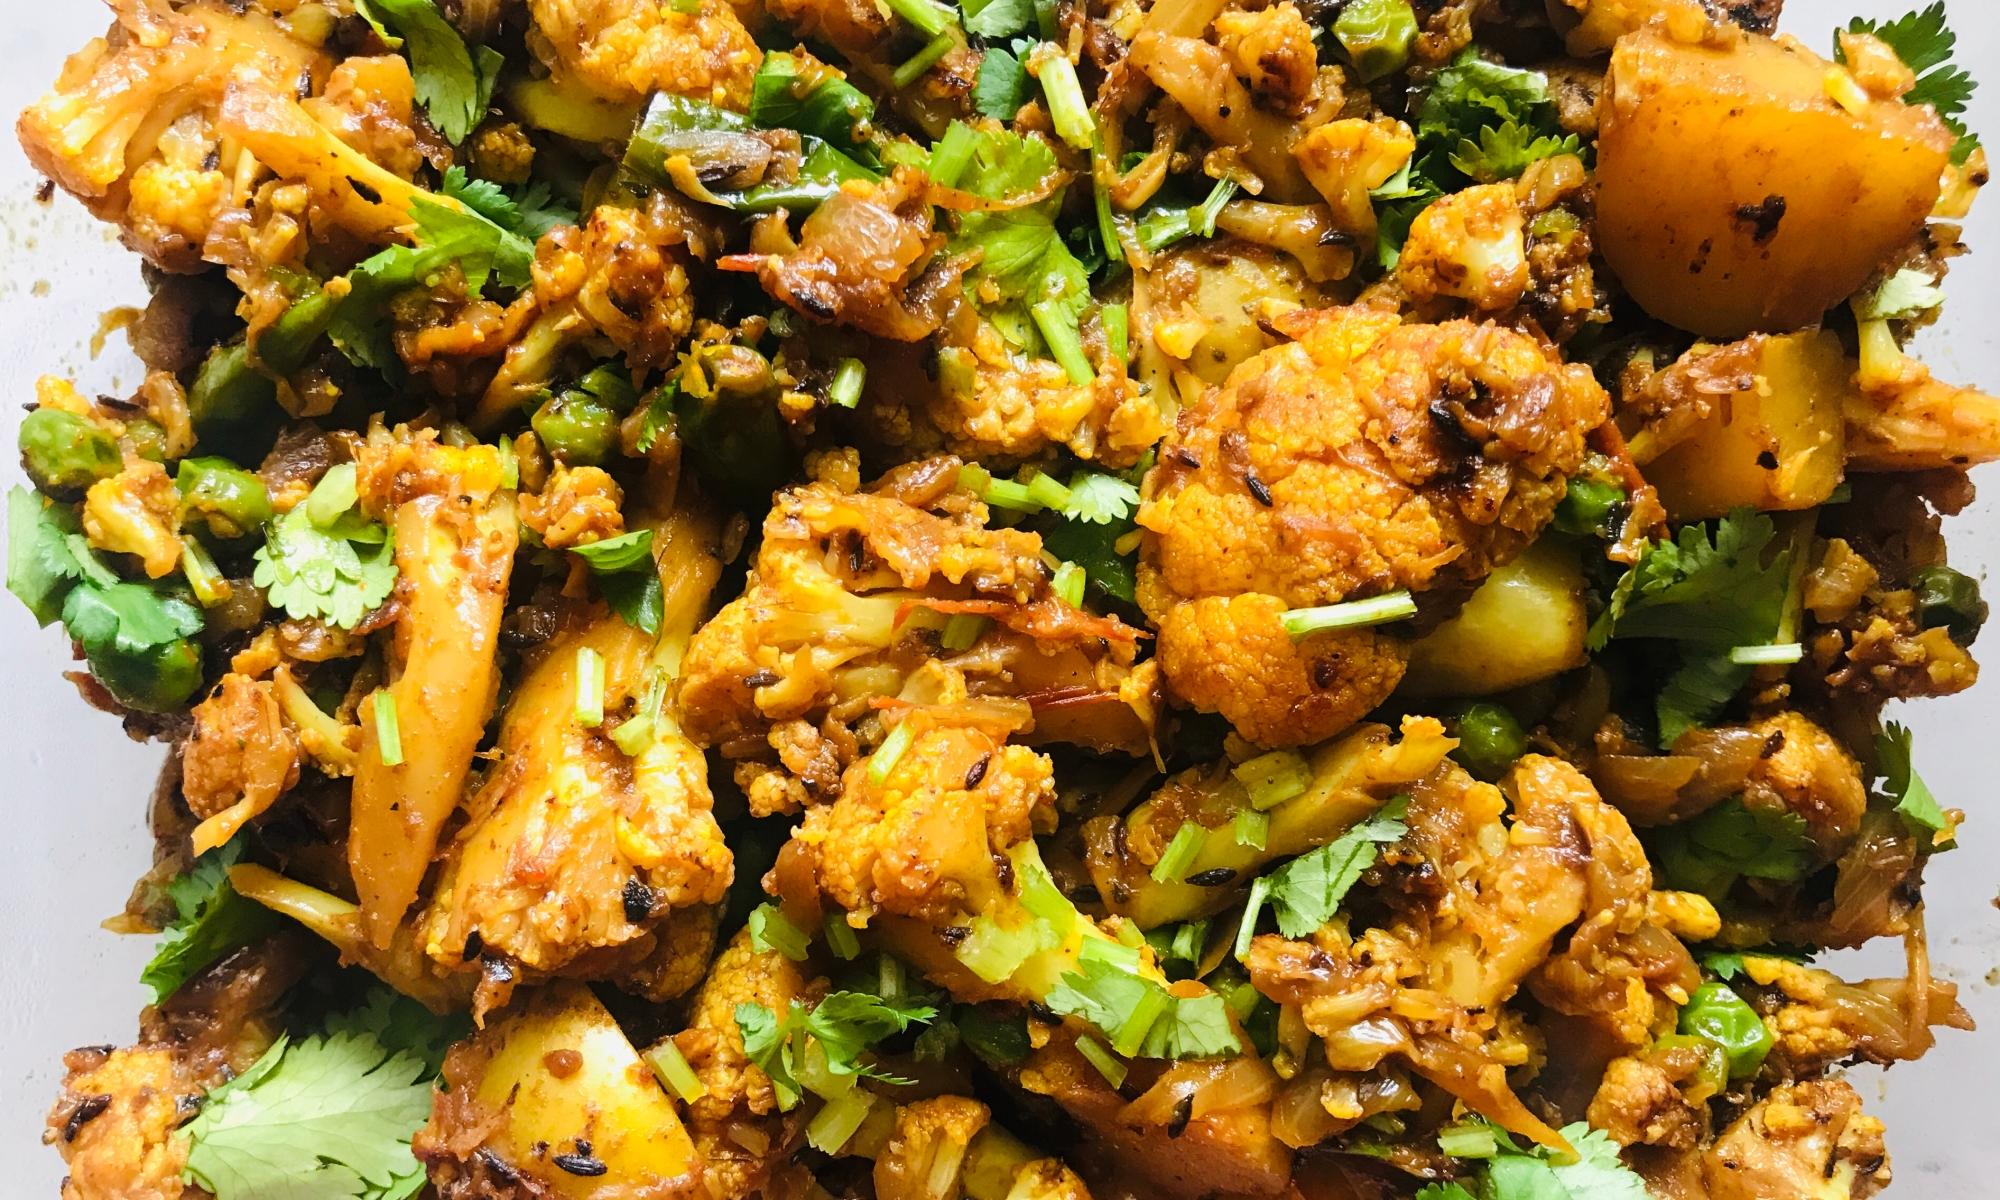 Easy Indian Style Cauliflower and Potato recipe